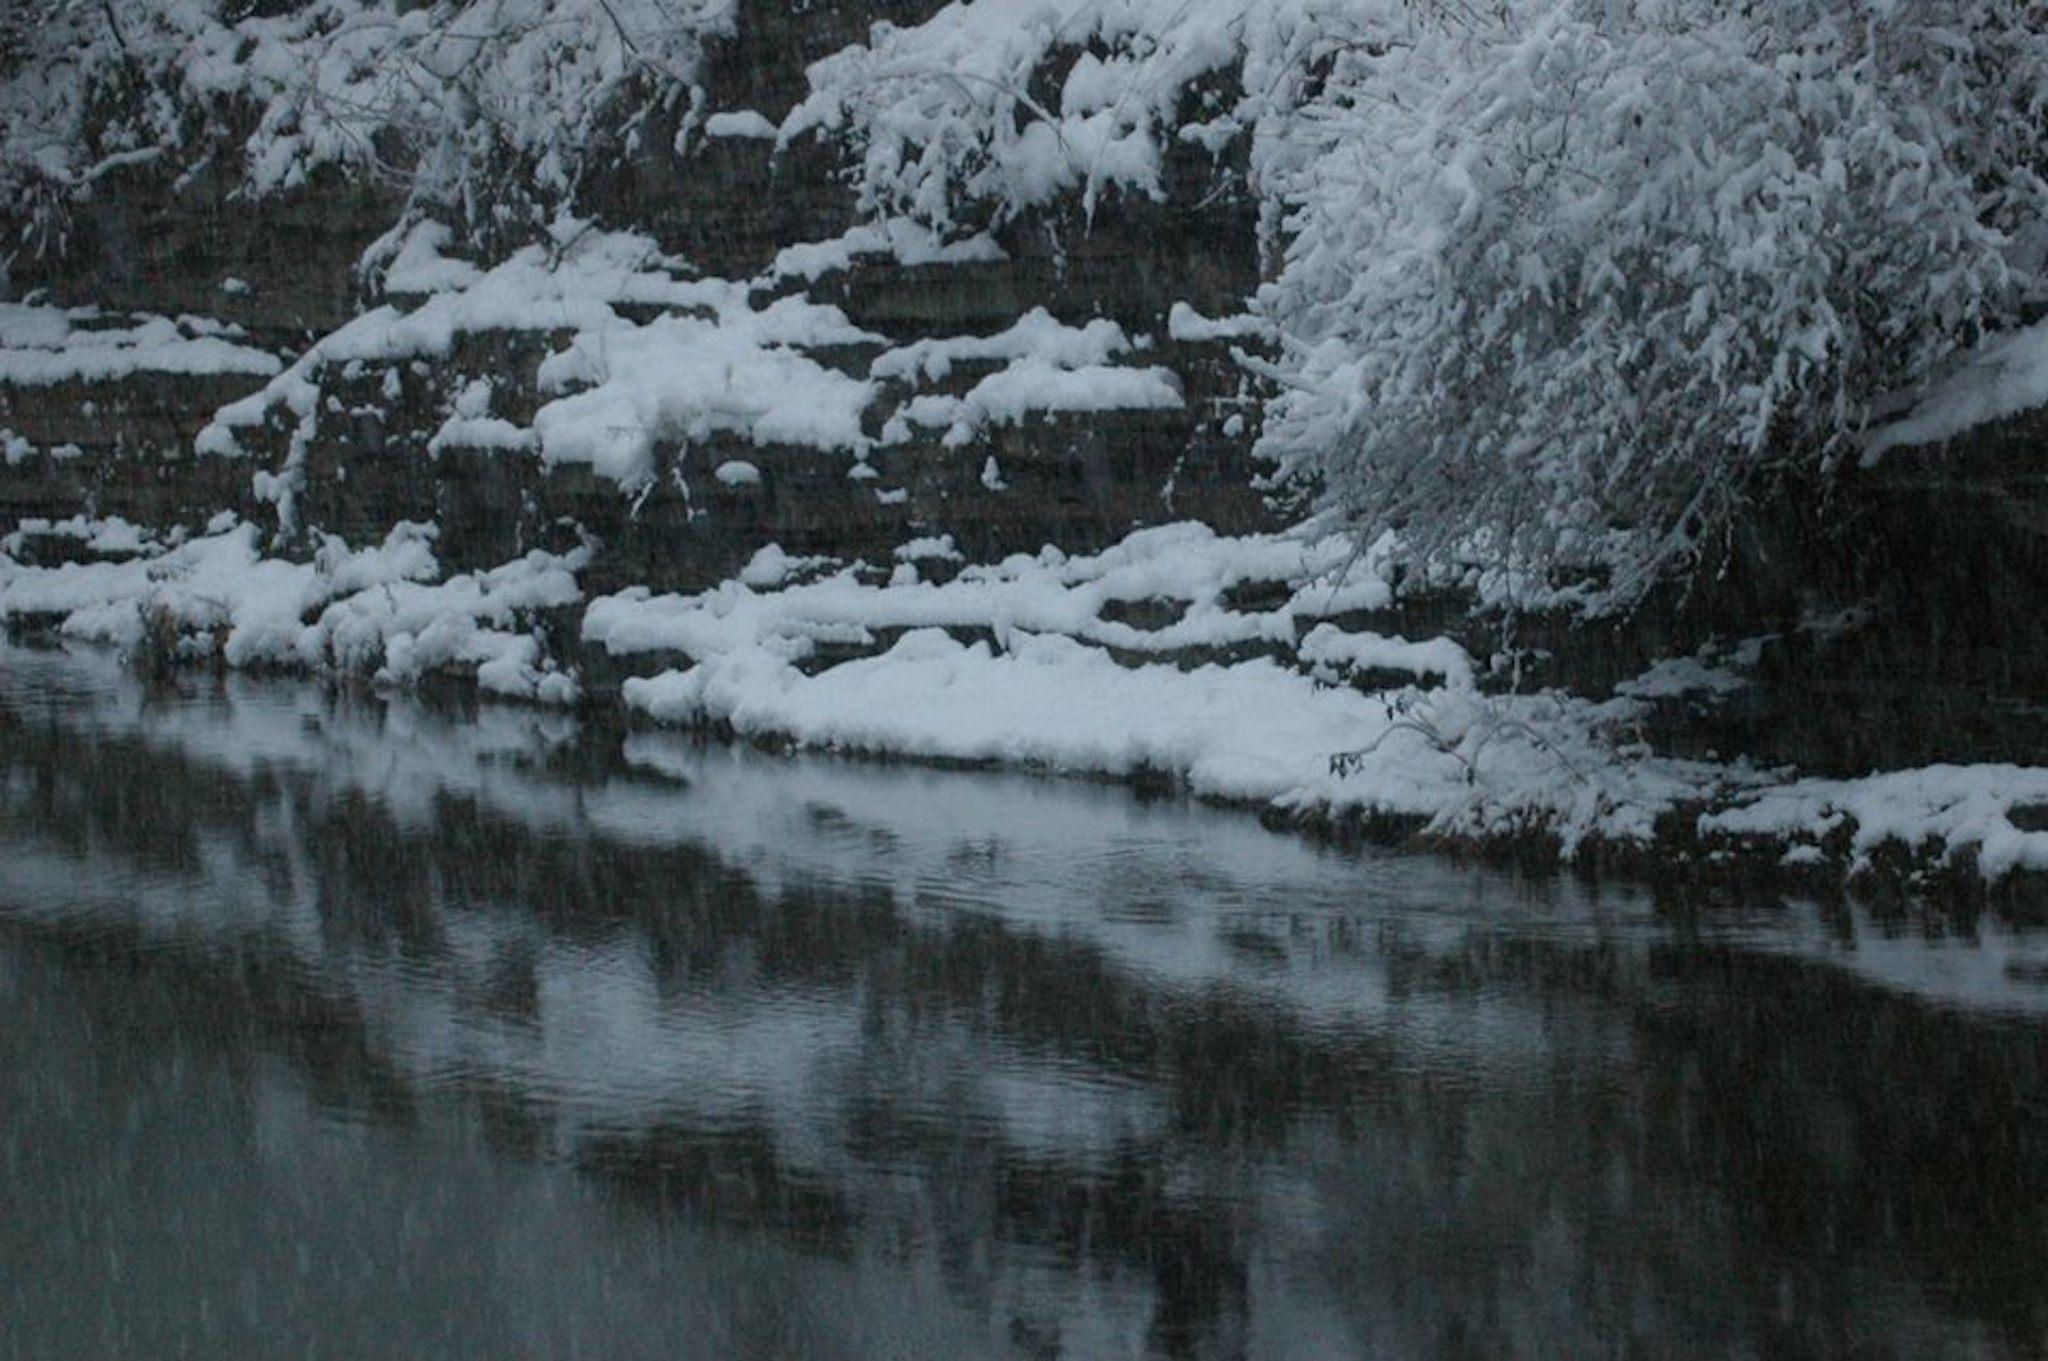 Farm Snow storm Nov 2014.jpg